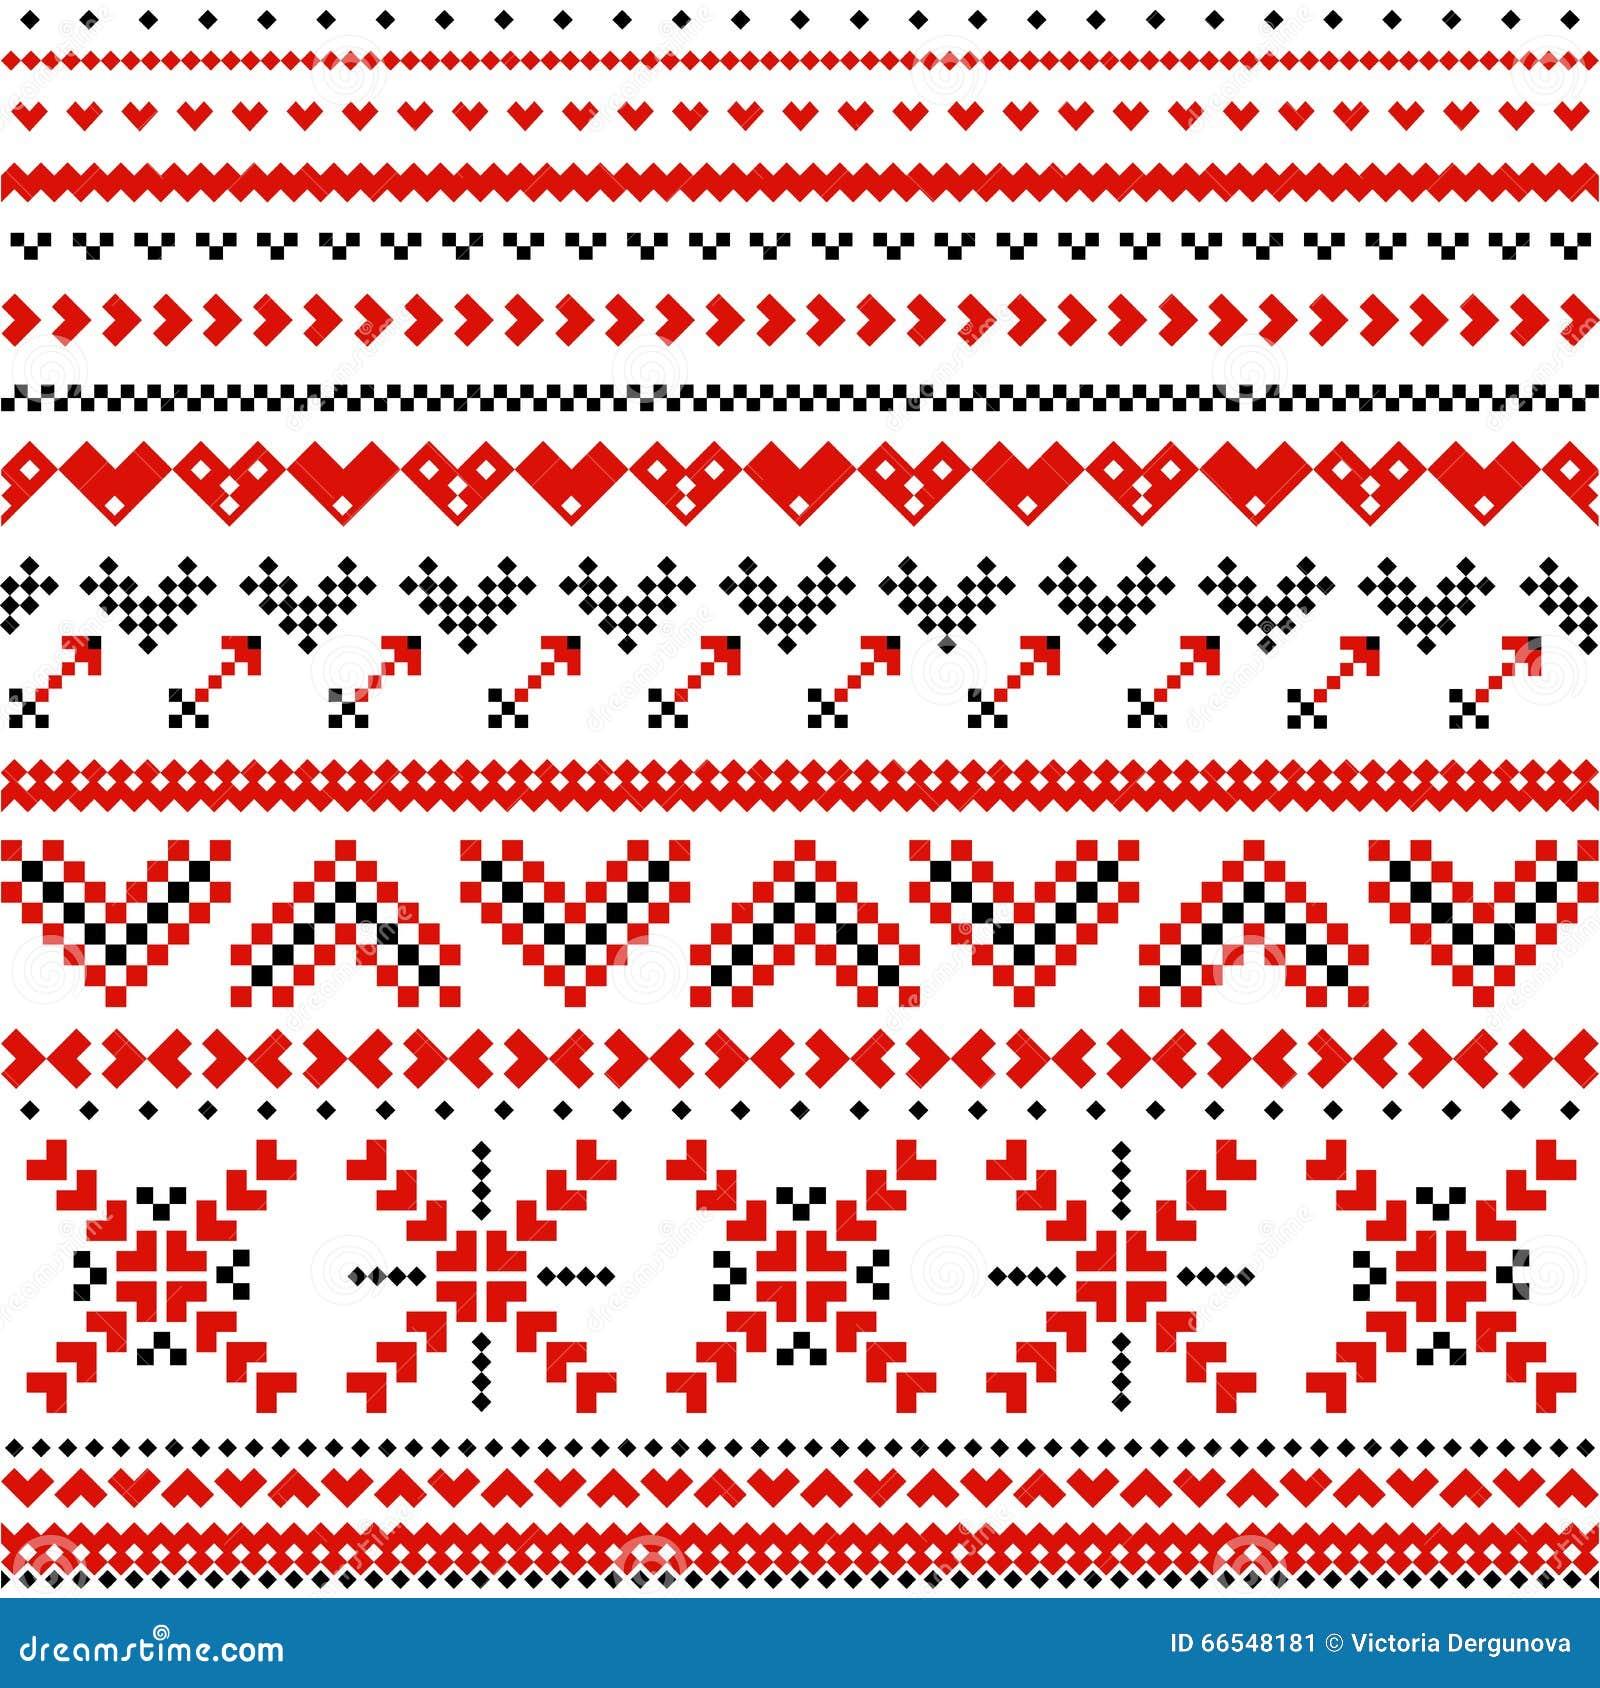 Skandinavisches design muster  Skandinavisches Muster Mit Herzen Vektor Abbildung - Illustration ...